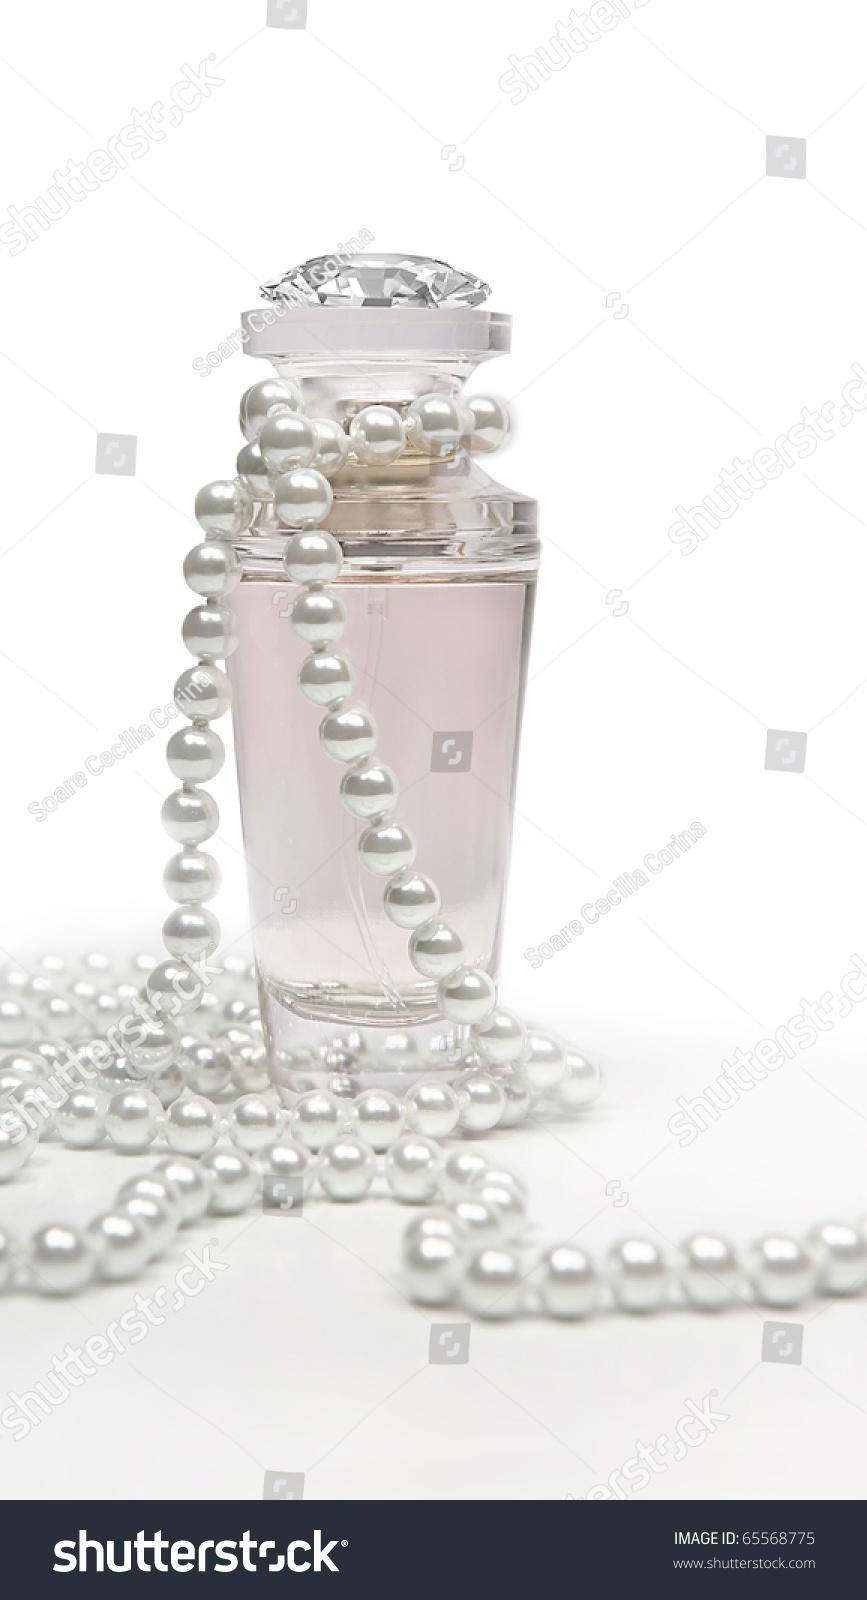 Vintage Perfume Bottle White Pearls Stock Photo 65568775 ...